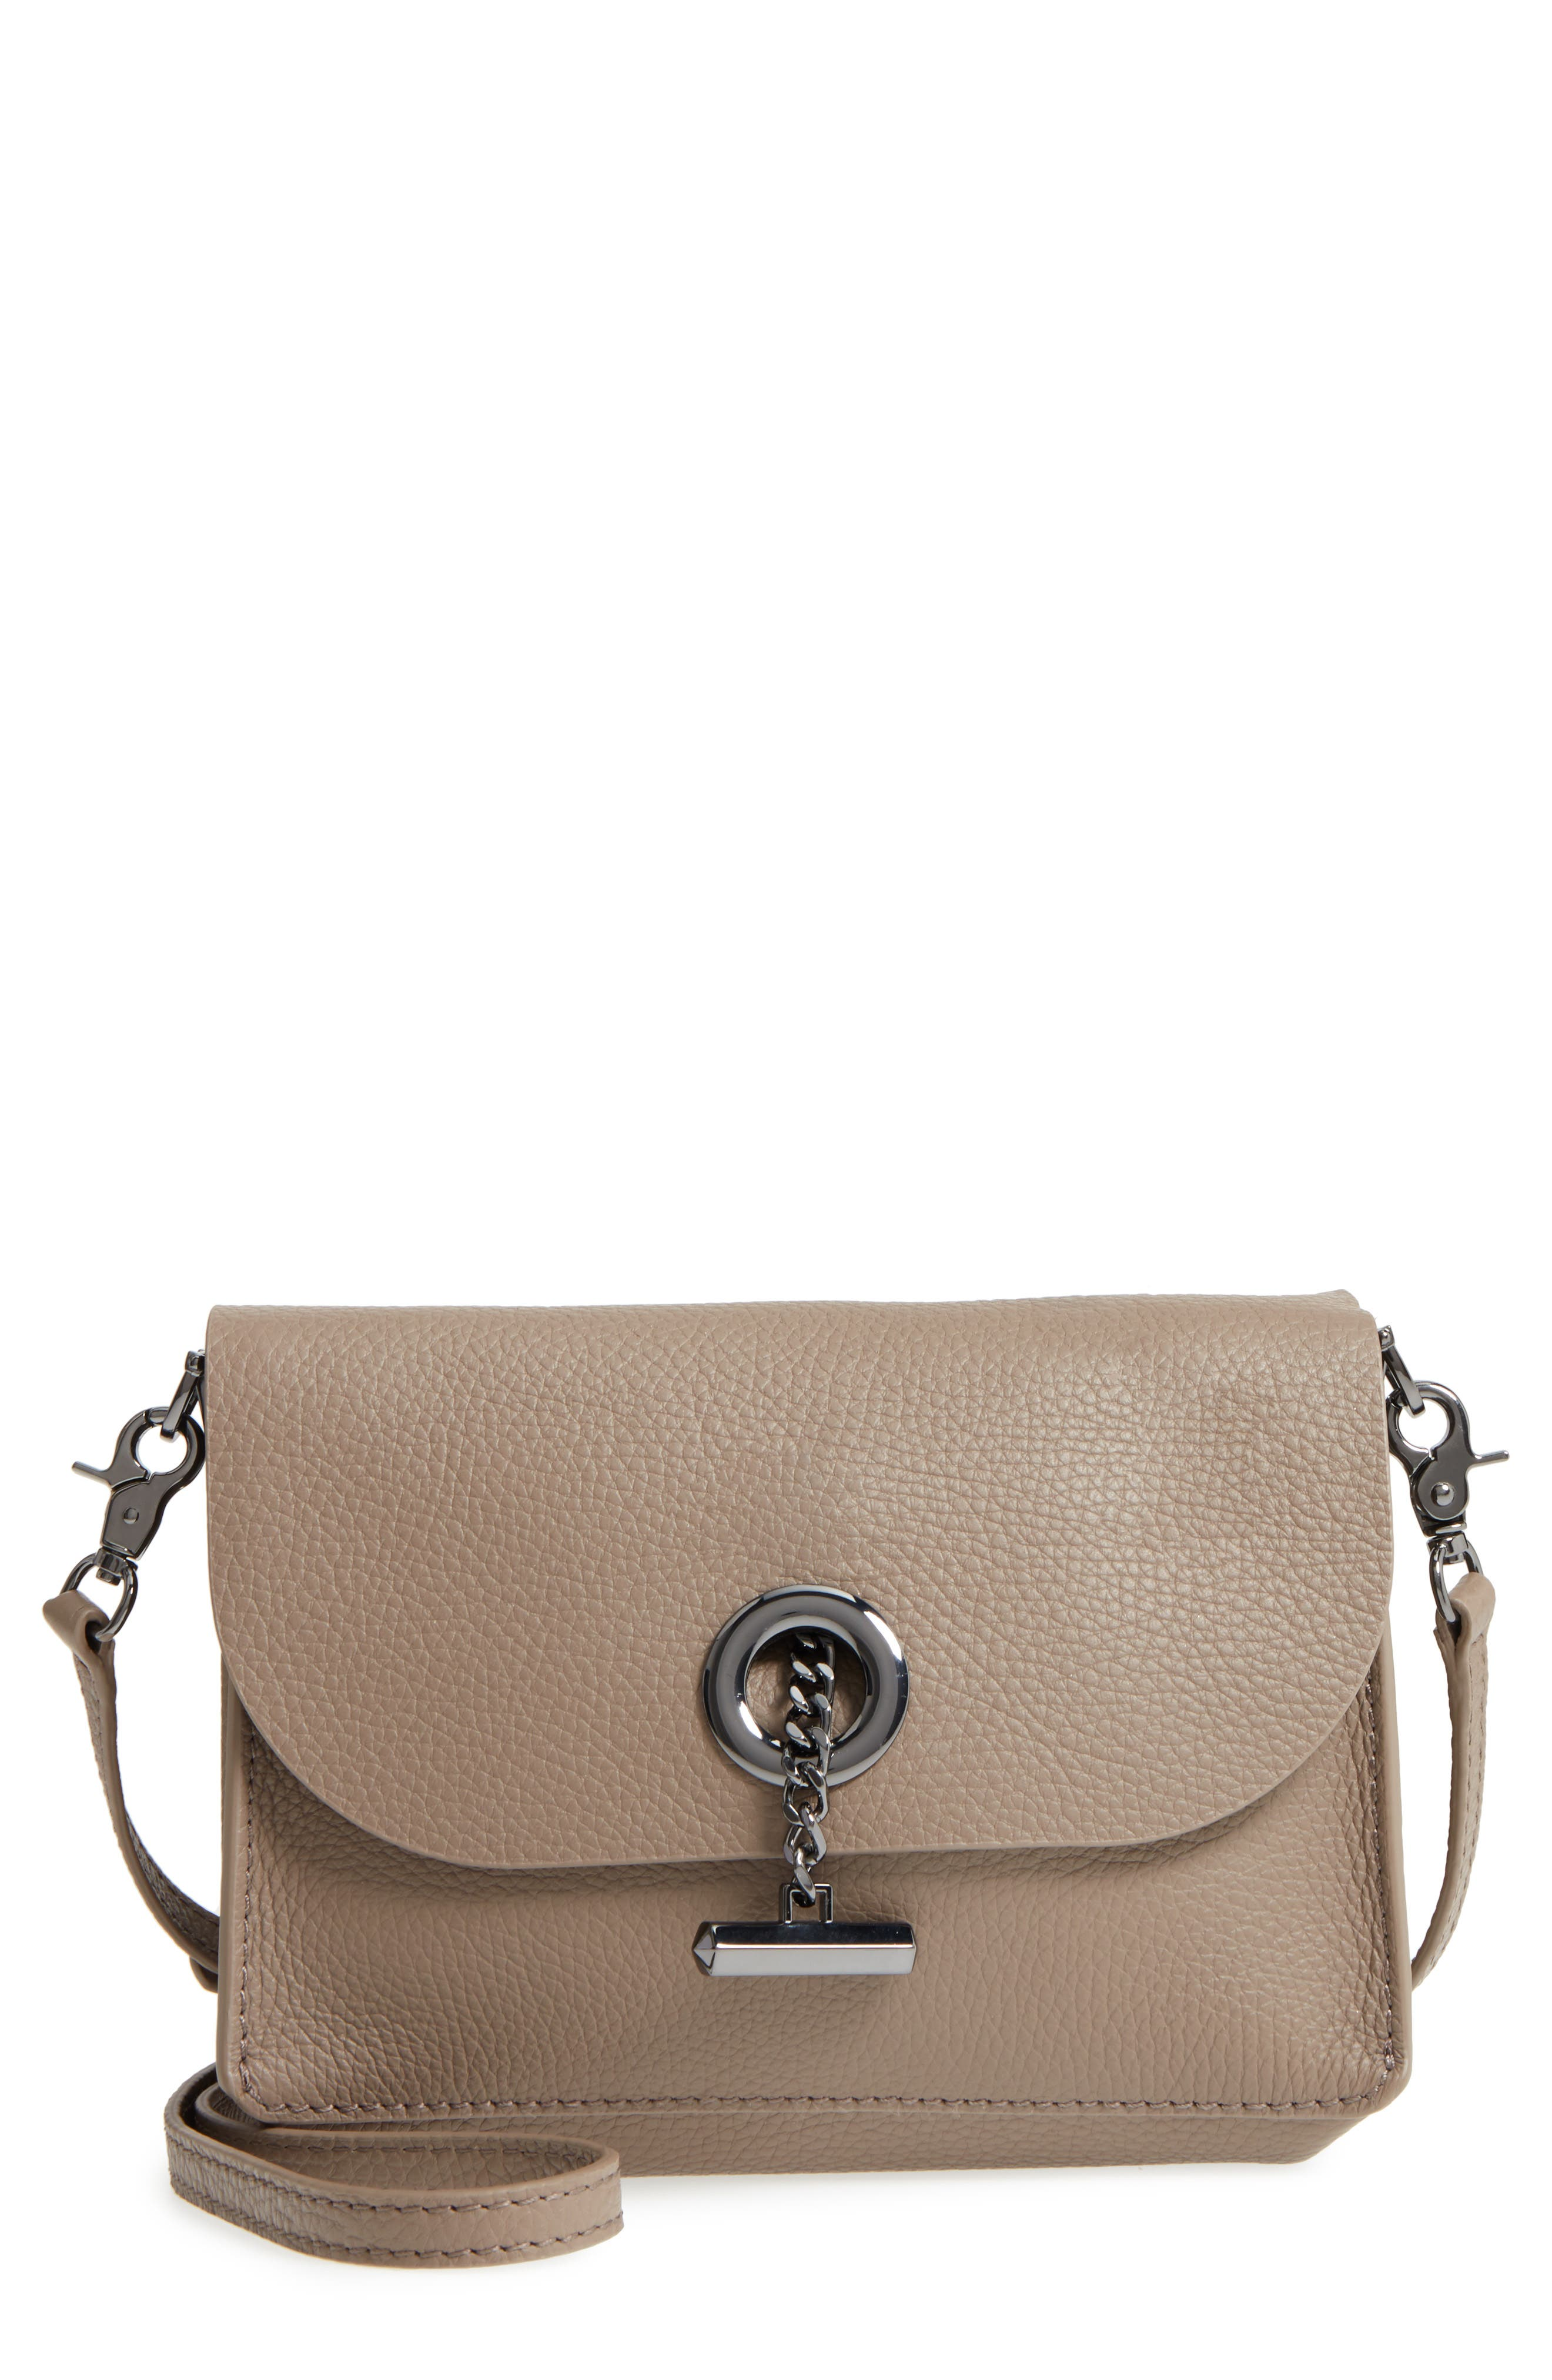 Alternate Image 1 Selected - Botkier Waverly Leather Crossbody Bag